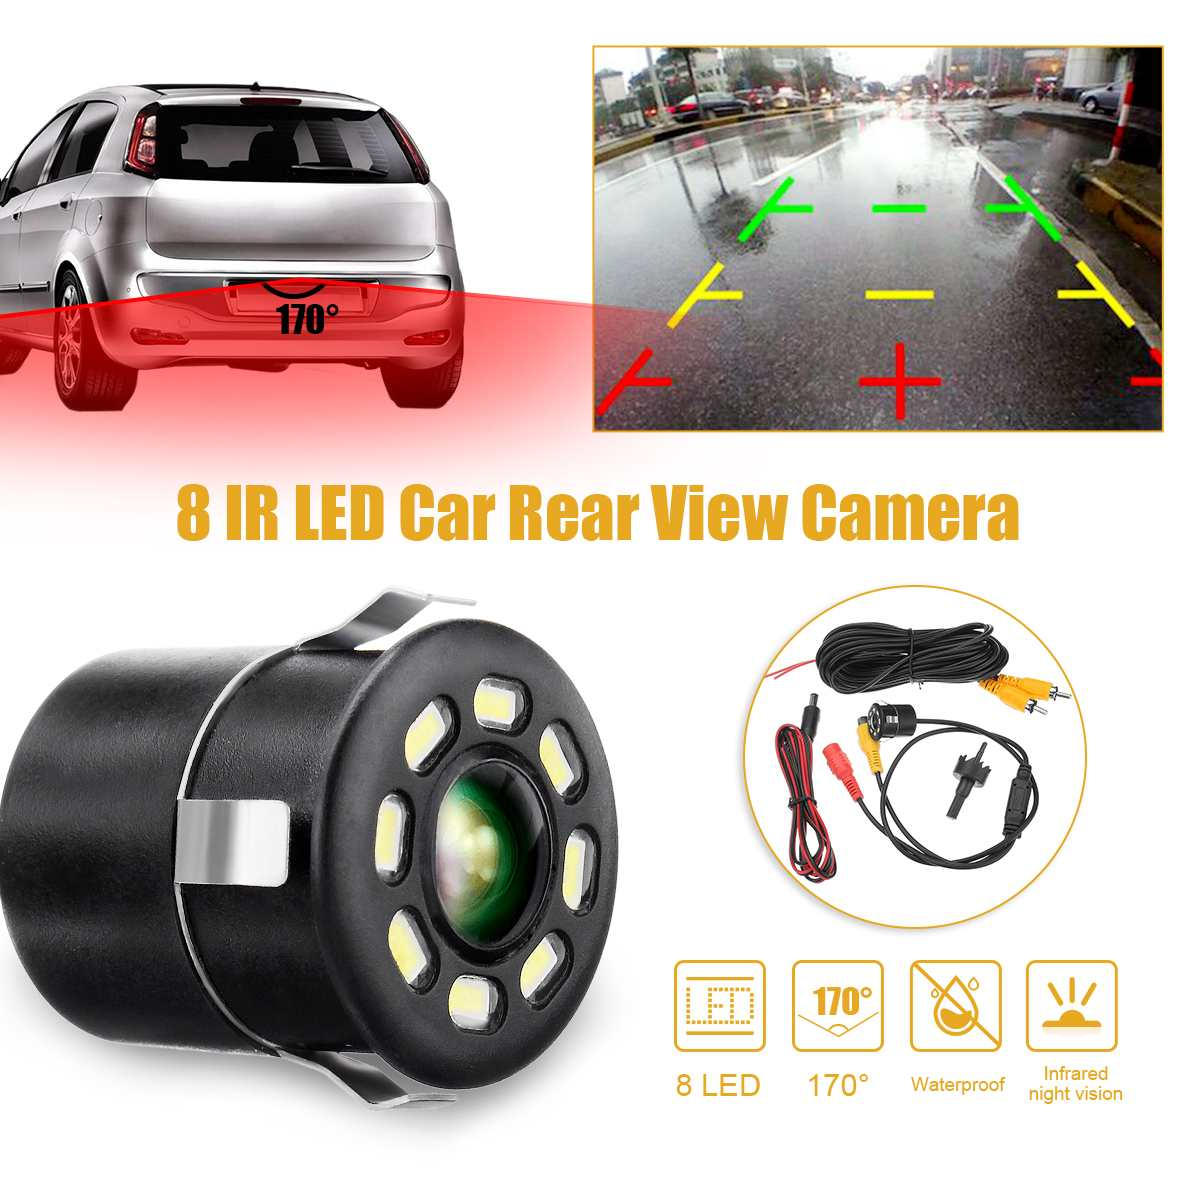 170 Degree 12V 8 LED Car Auto Rear View Backup Camera HD Parking Reverse Cam IR Night Vision Waterproof Vehicle Parking Camera